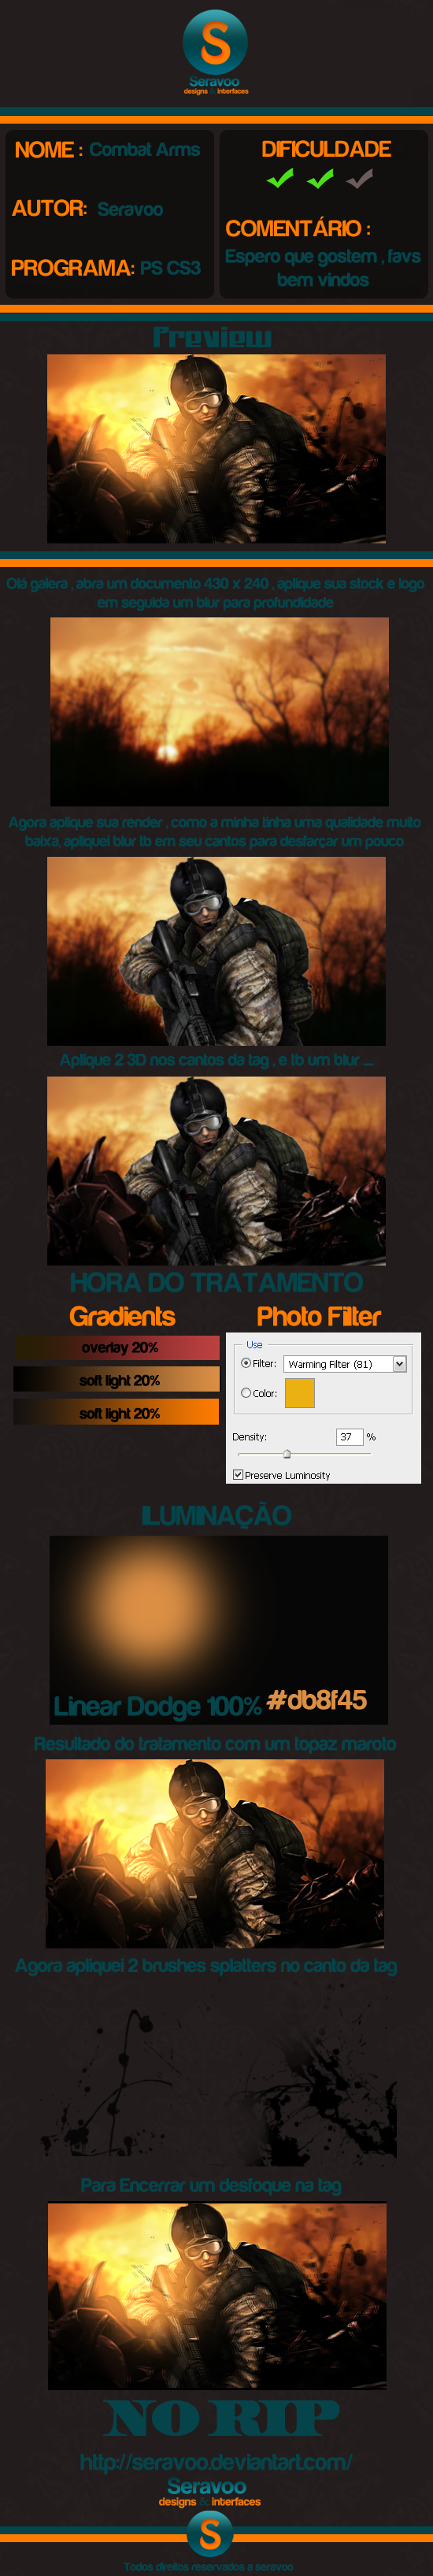 [Photoshop - Tutorial][Gfx Combat Arms by:seravoo] Tutorial_combat_arms_by_seravoo-d32e99j